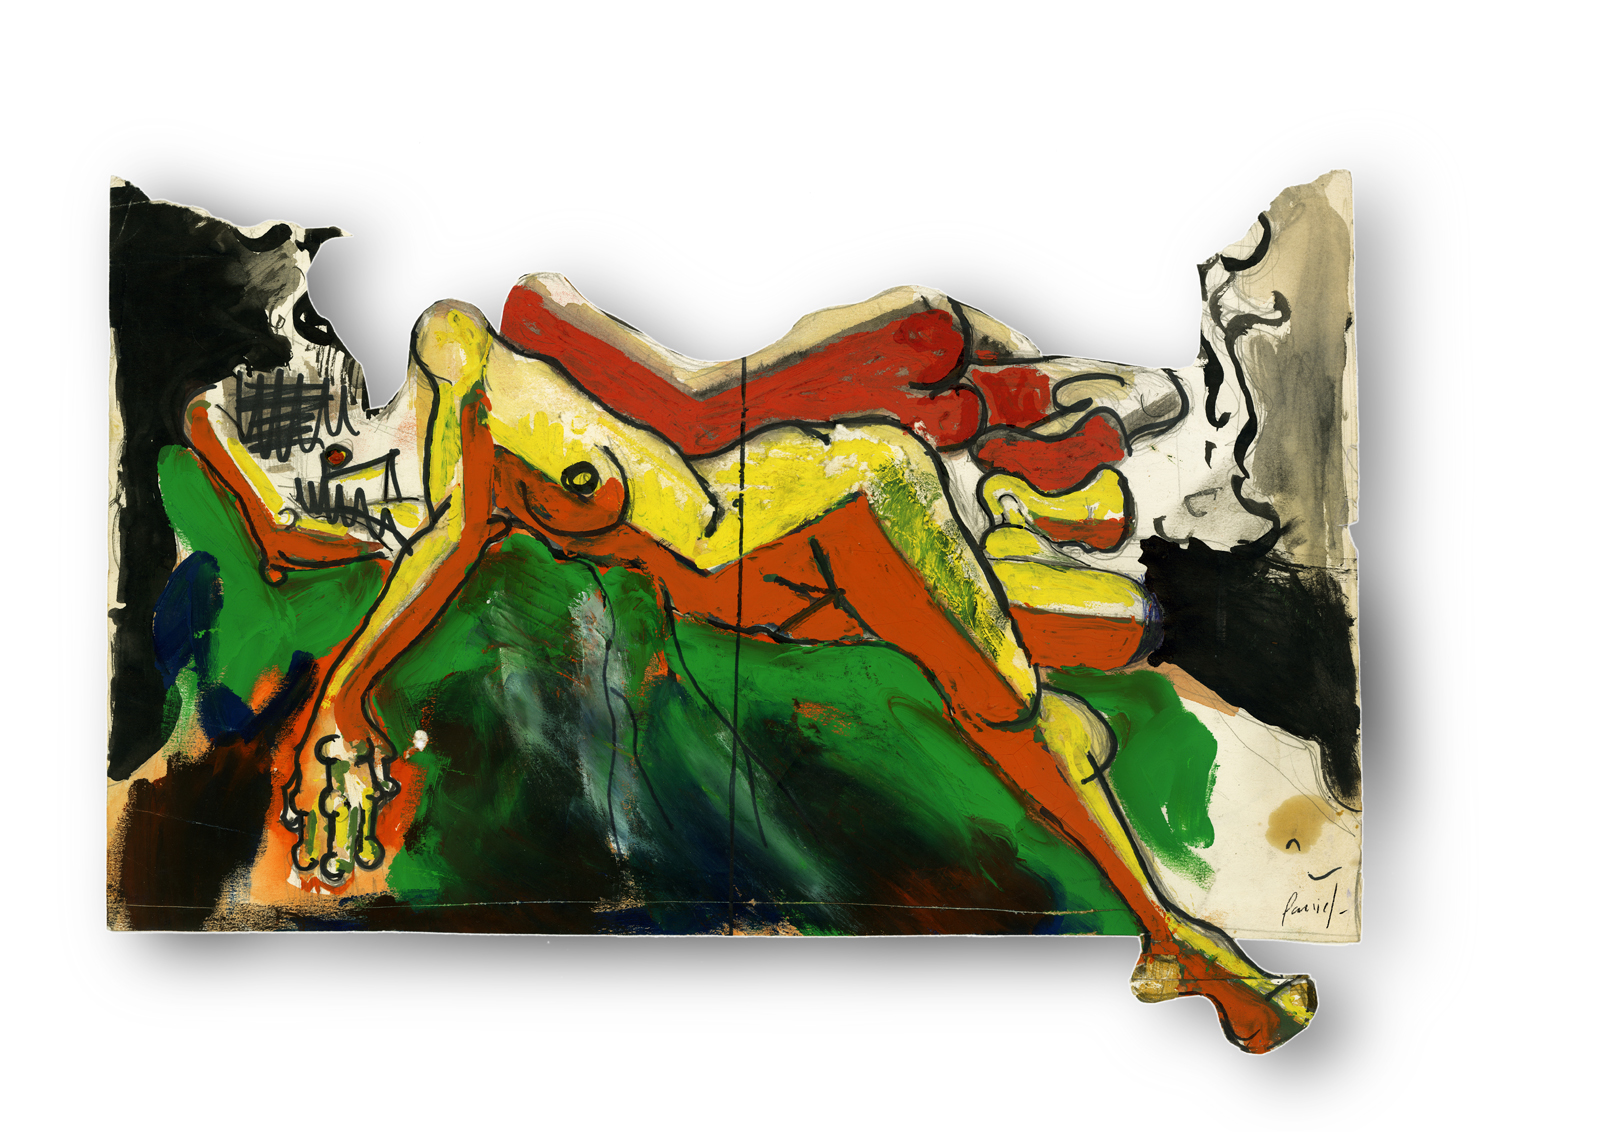 danielvillalobos-spanish-painting-twentiethcentury-cubism-11